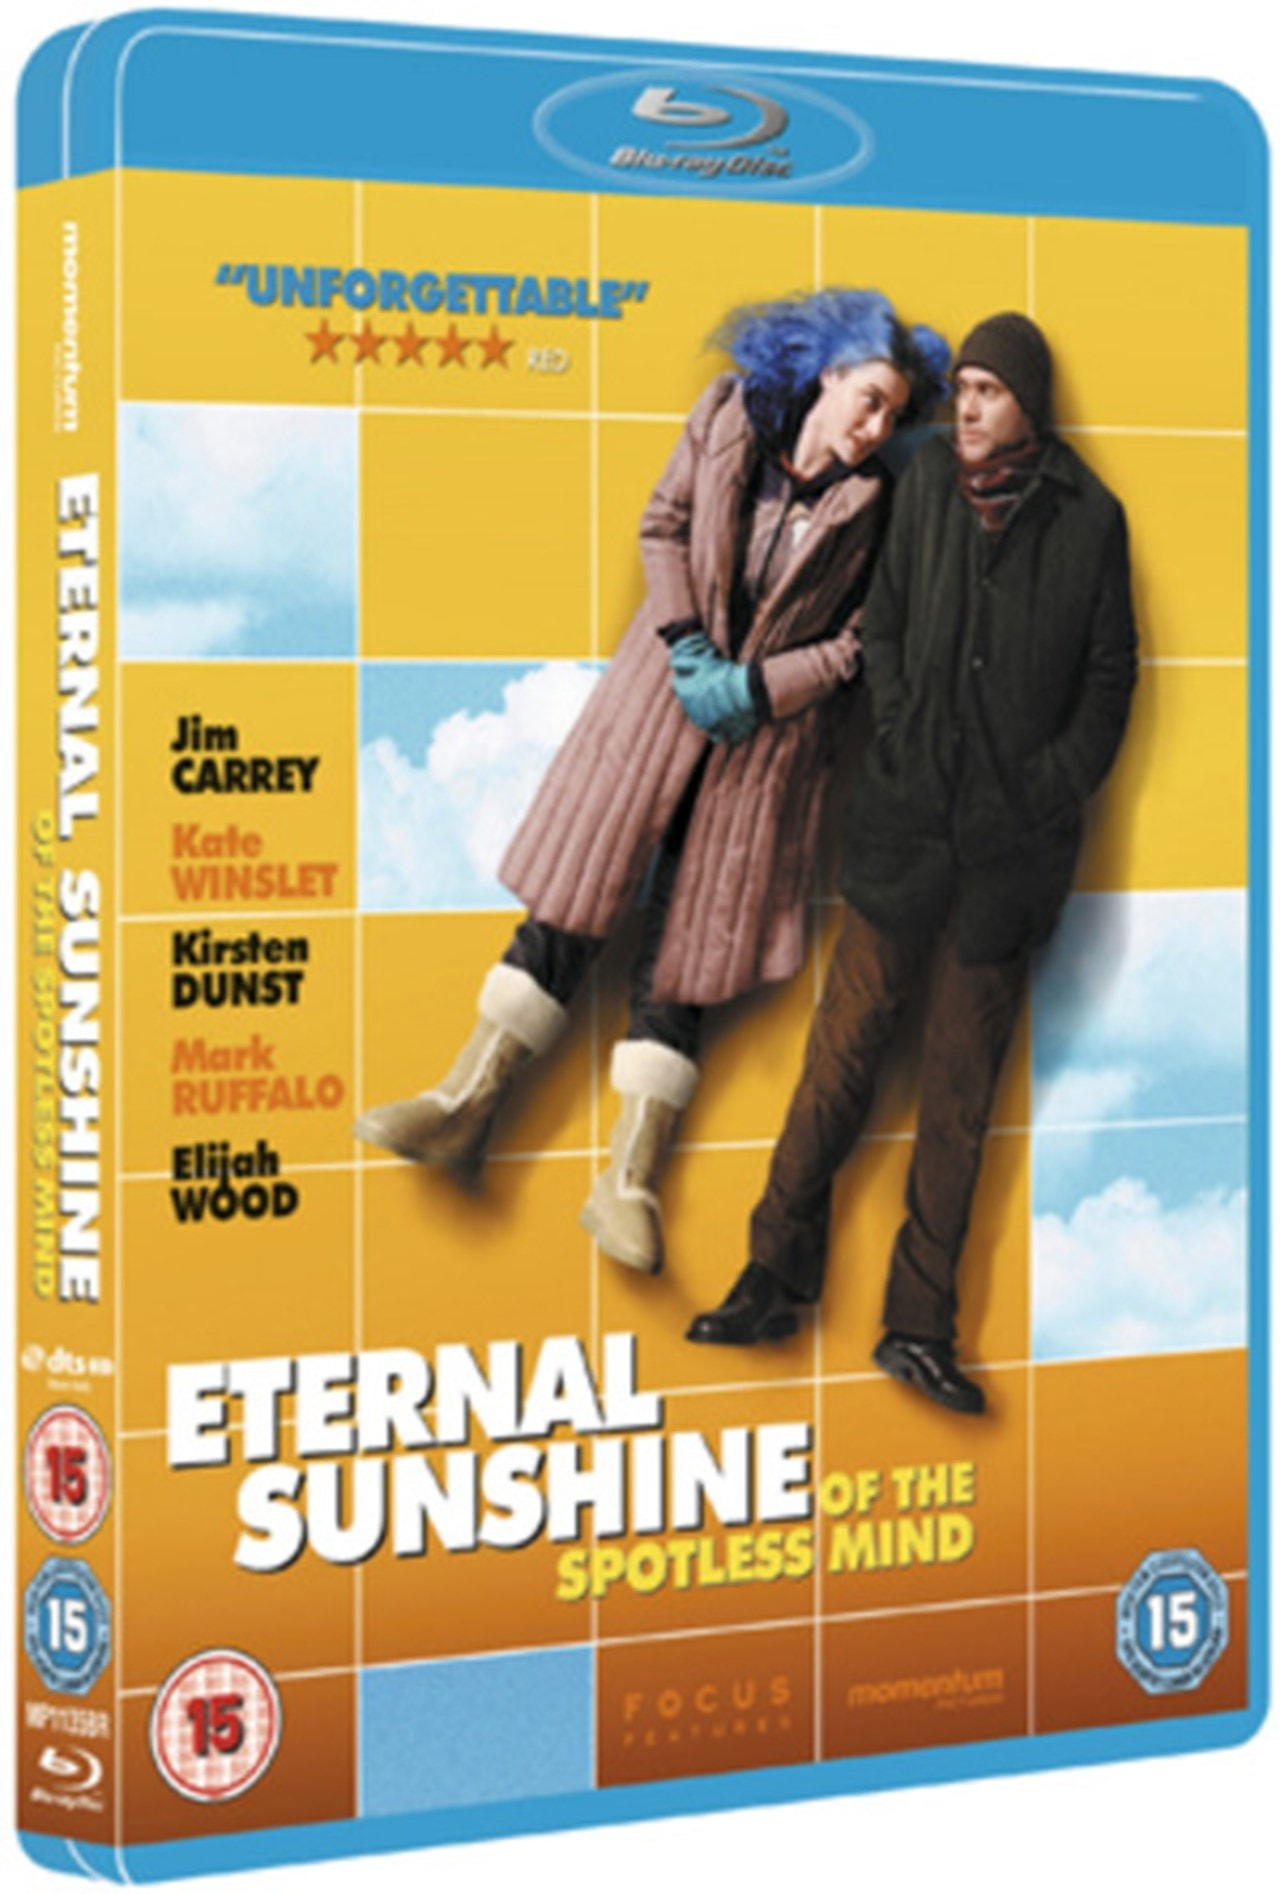 Eternal Sunshine of the Spotless Mind - 1